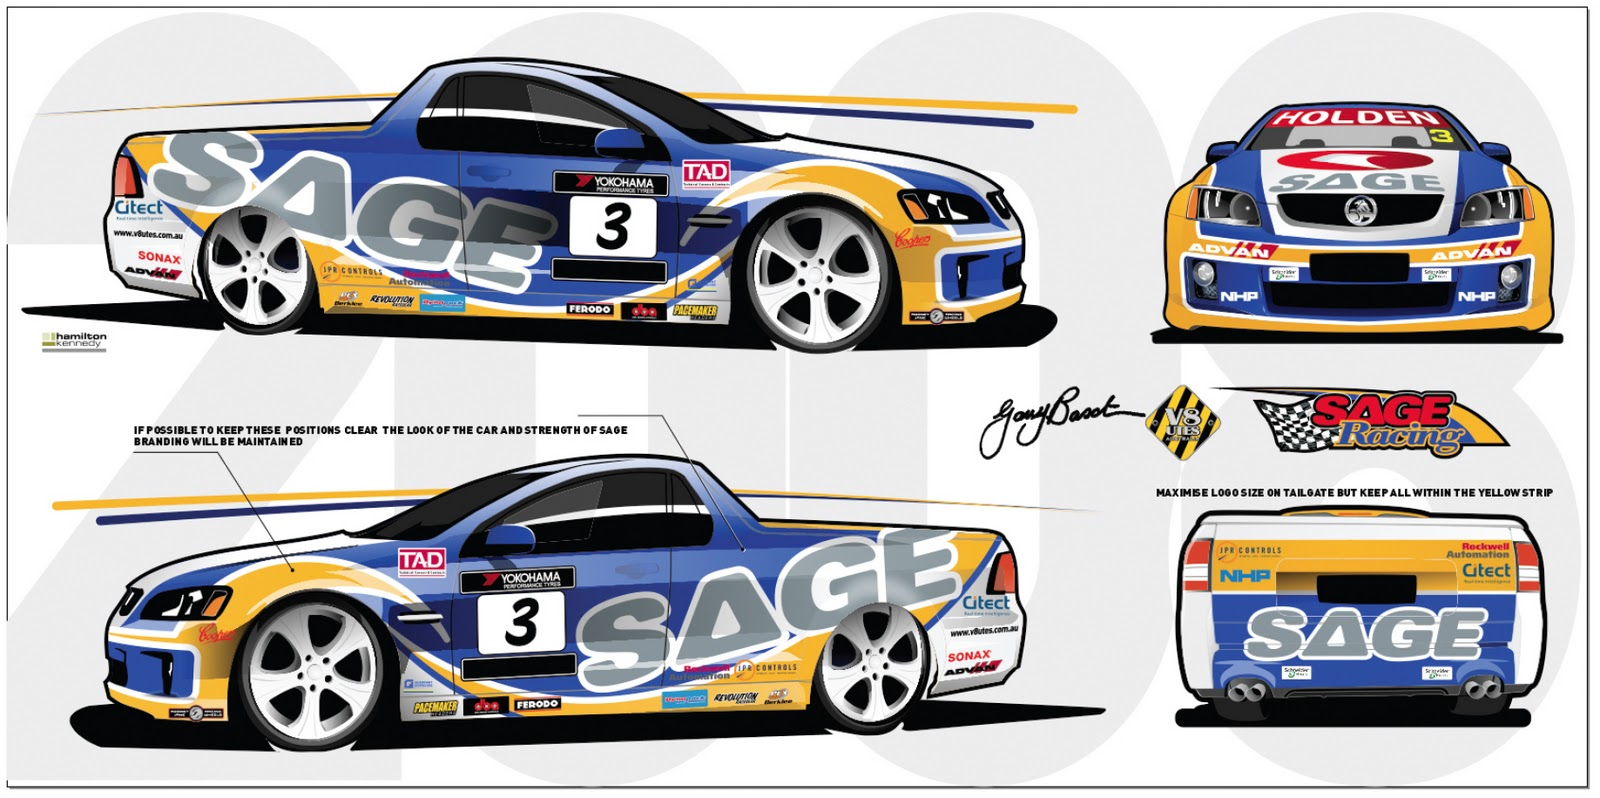 race car graphic design templates - download free software race car graphics design program